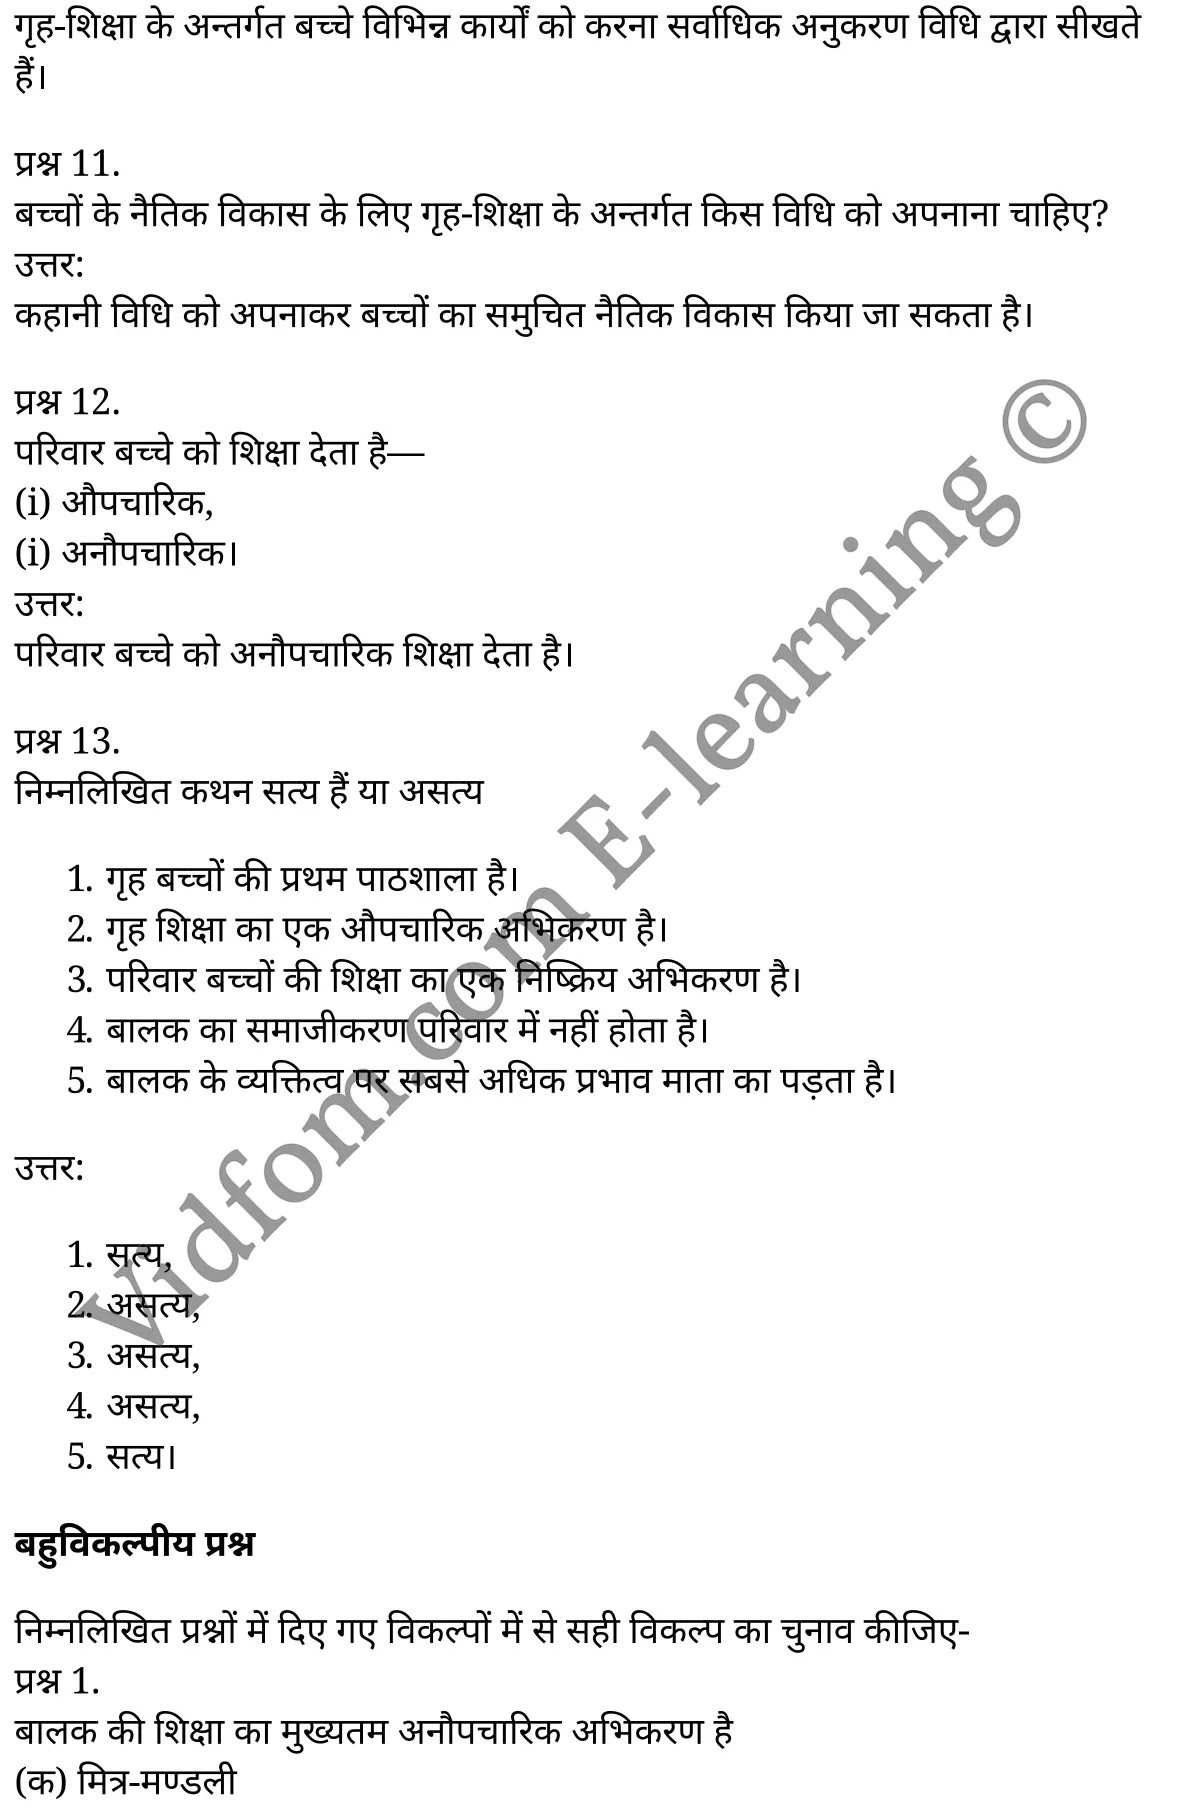 कक्षा 11 शिक्षाशास्त्र  के नोट्स  हिंदी में एनसीईआरटी समाधान,     class 11 Pedagogy chapter 6,   class 11 Pedagogy chapter 6 ncert solutions in Pedagogy,  class 11 Pedagogy chapter 6 notes in hindi,   class 11 Pedagogy chapter 6 question answer,   class 11 Pedagogy chapter 6 notes,   class 11 Pedagogy chapter 6 class 11 Pedagogy  chapter 6 in  hindi,    class 11 Pedagogy chapter 6 important questions in  hindi,   class 11 Pedagogy hindi  chapter 6 notes in hindi,   class 11 Pedagogy  chapter 6 test,   class 11 Pedagogy  chapter 6 class 11 Pedagogy  chapter 6 pdf,   class 11 Pedagogy  chapter 6 notes pdf,   class 11 Pedagogy  chapter 6 exercise solutions,  class 11 Pedagogy  chapter 6,  class 11 Pedagogy  chapter 6 notes study rankers,  class 11 Pedagogy  chapter 6 notes,   class 11 Pedagogy hindi  chapter 6 notes,    class 11 Pedagogy   chapter 6  class 11  notes pdf,  class 11 Pedagogy  chapter 6 class 11  notes  ncert,  class 11 Pedagogy  chapter 6 class 11 pdf,   class 11 Pedagogy  chapter 6  book,   class 11 Pedagogy  chapter 6 quiz class 11  ,    11  th class 11 Pedagogy chapter 6  book up board,   up board 11  th class 11 Pedagogy chapter 6 notes,  class 11 Pedagogy,   class 11 Pedagogy ncert solutions in Pedagogy,   class 11 Pedagogy notes in hindi,   class 11 Pedagogy question answer,   class 11 Pedagogy notes,  class 11 Pedagogy class 11 Pedagogy  chapter 6 in  hindi,    class 11 Pedagogy important questions in  hindi,   class 11 Pedagogy notes in hindi,    class 11 Pedagogy test,  class 11 Pedagogy class 11 Pedagogy  chapter 6 pdf,   class 11 Pedagogy notes pdf,   class 11 Pedagogy exercise solutions,   class 11 Pedagogy,  class 11 Pedagogy notes study rankers,   class 11 Pedagogy notes,  class 11 Pedagogy notes,   class 11 Pedagogy  class 11  notes pdf,   class 11 Pedagogy class 11  notes  ncert,   class 11 Pedagogy class 11 pdf,   class 11 Pedagogy  book,  class 11 Pedagogy quiz class 11  ,  11  th class 11 Pedagogy    book up board,    up board 11  th c